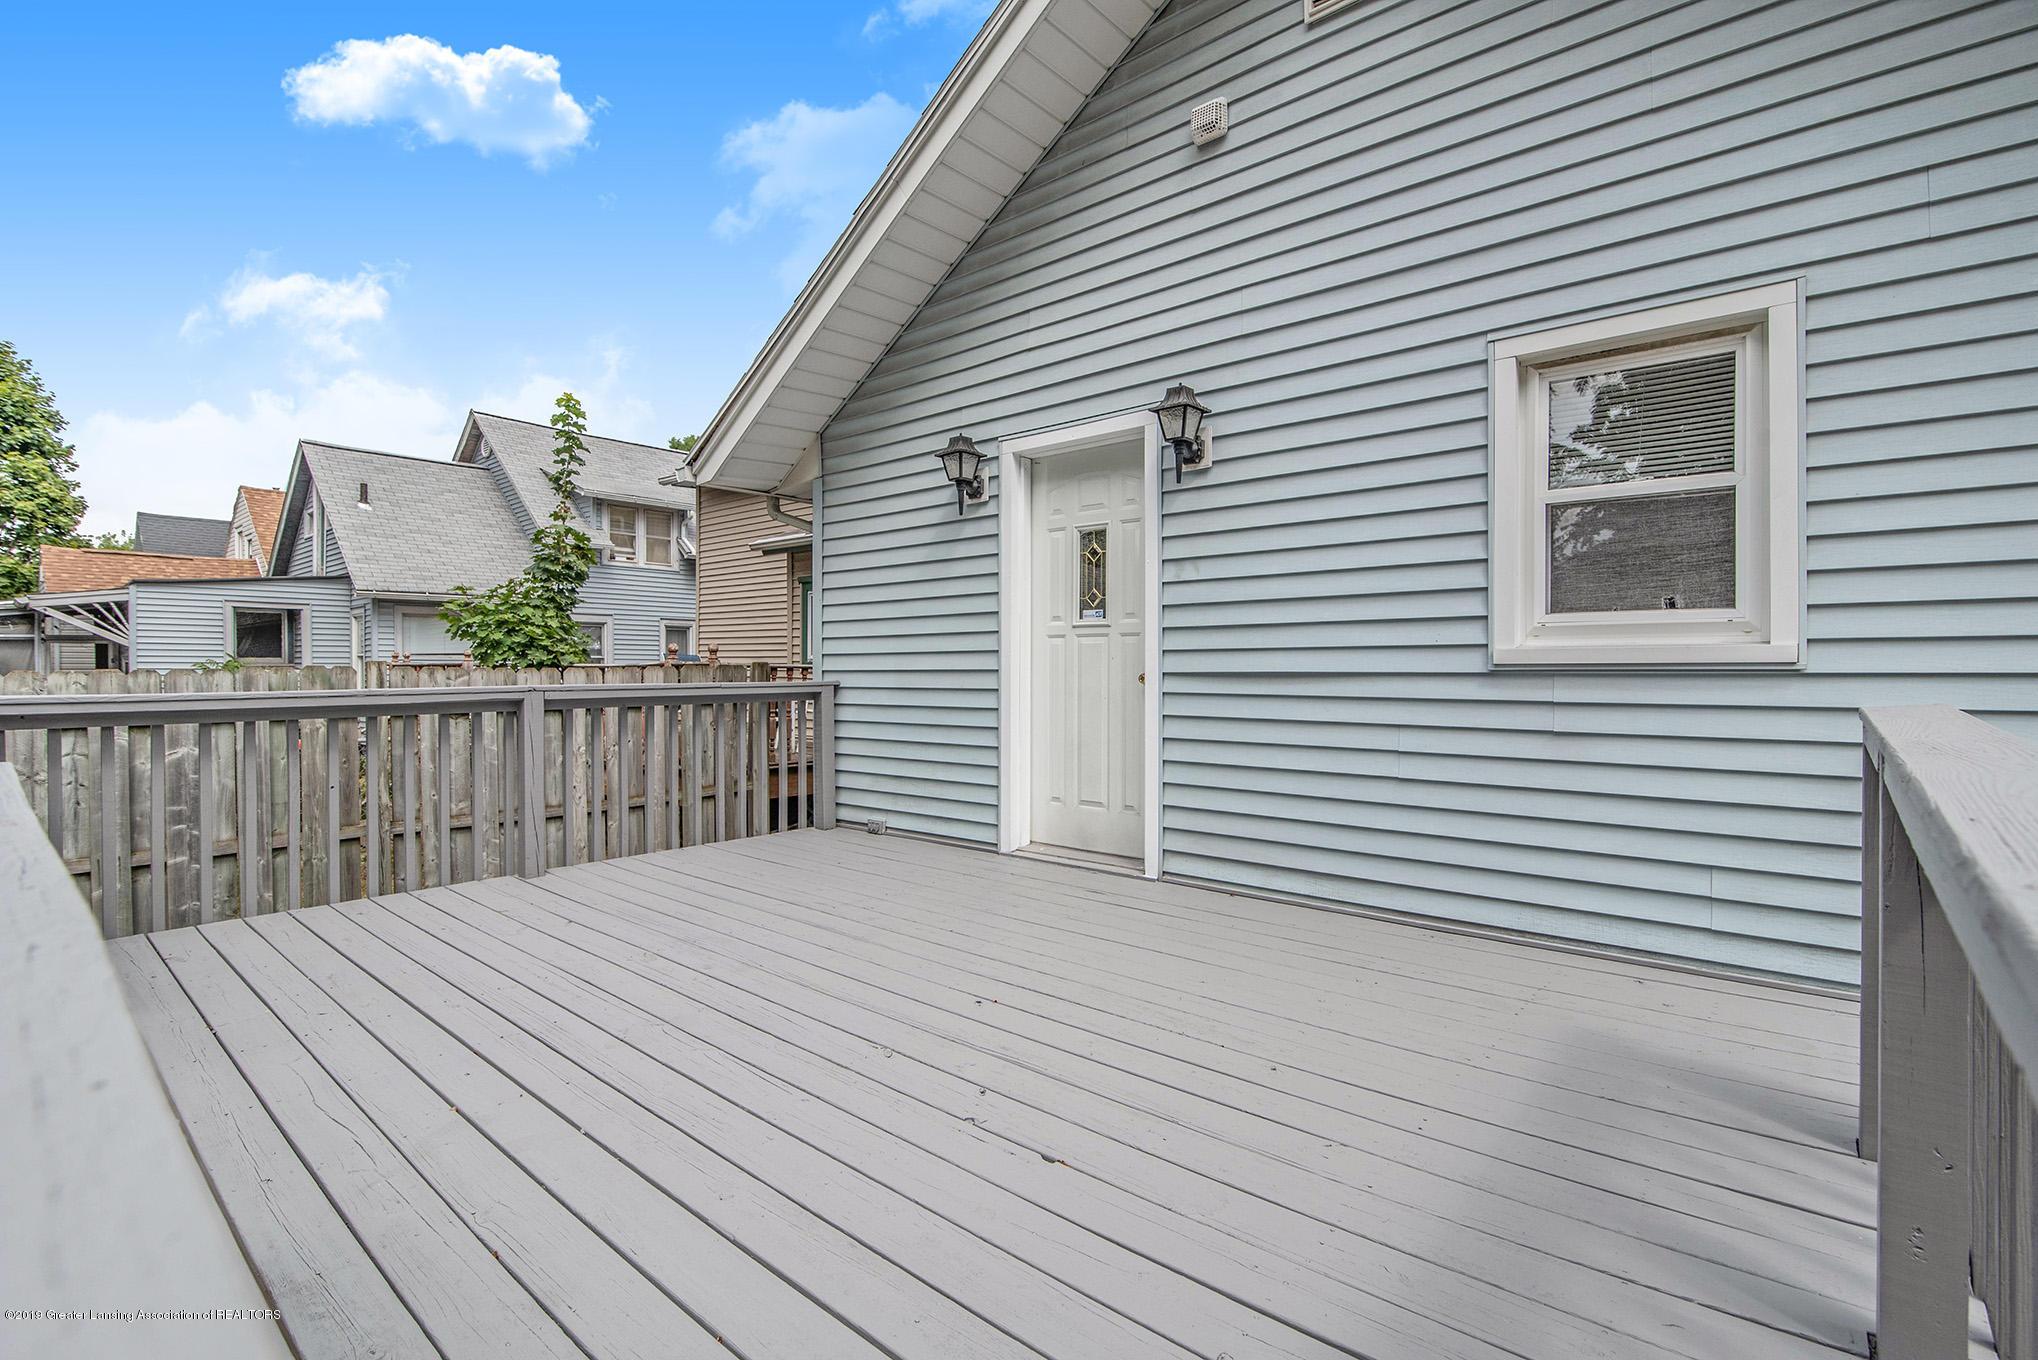 319 N Hayford Ave - 18 deck - 18